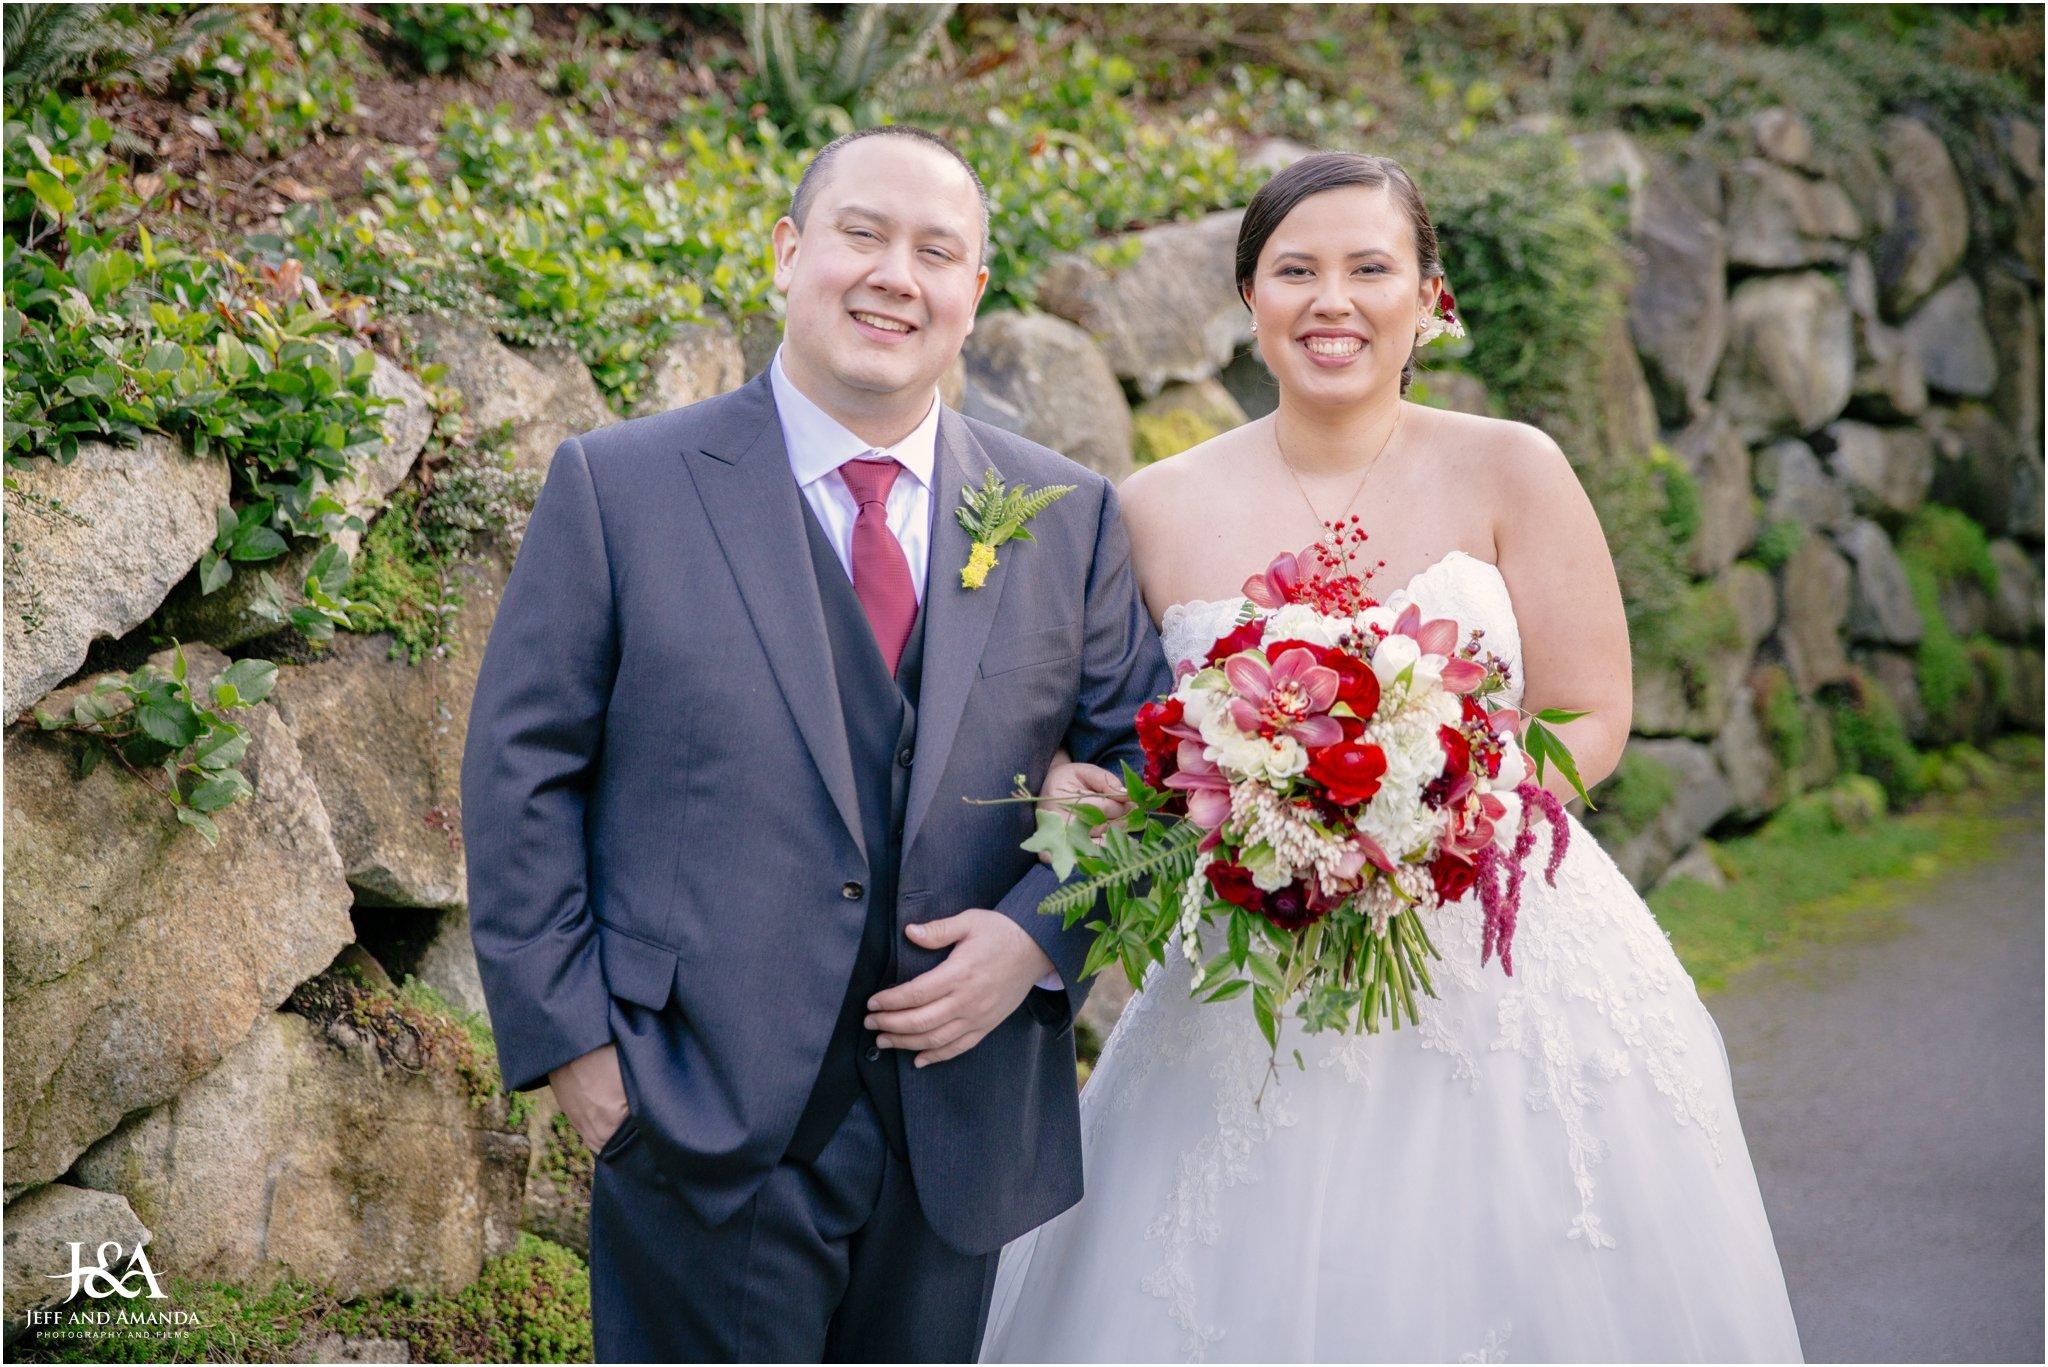 Dave and Kari s Wedding-Facebook Ready-0274 (1).jpg